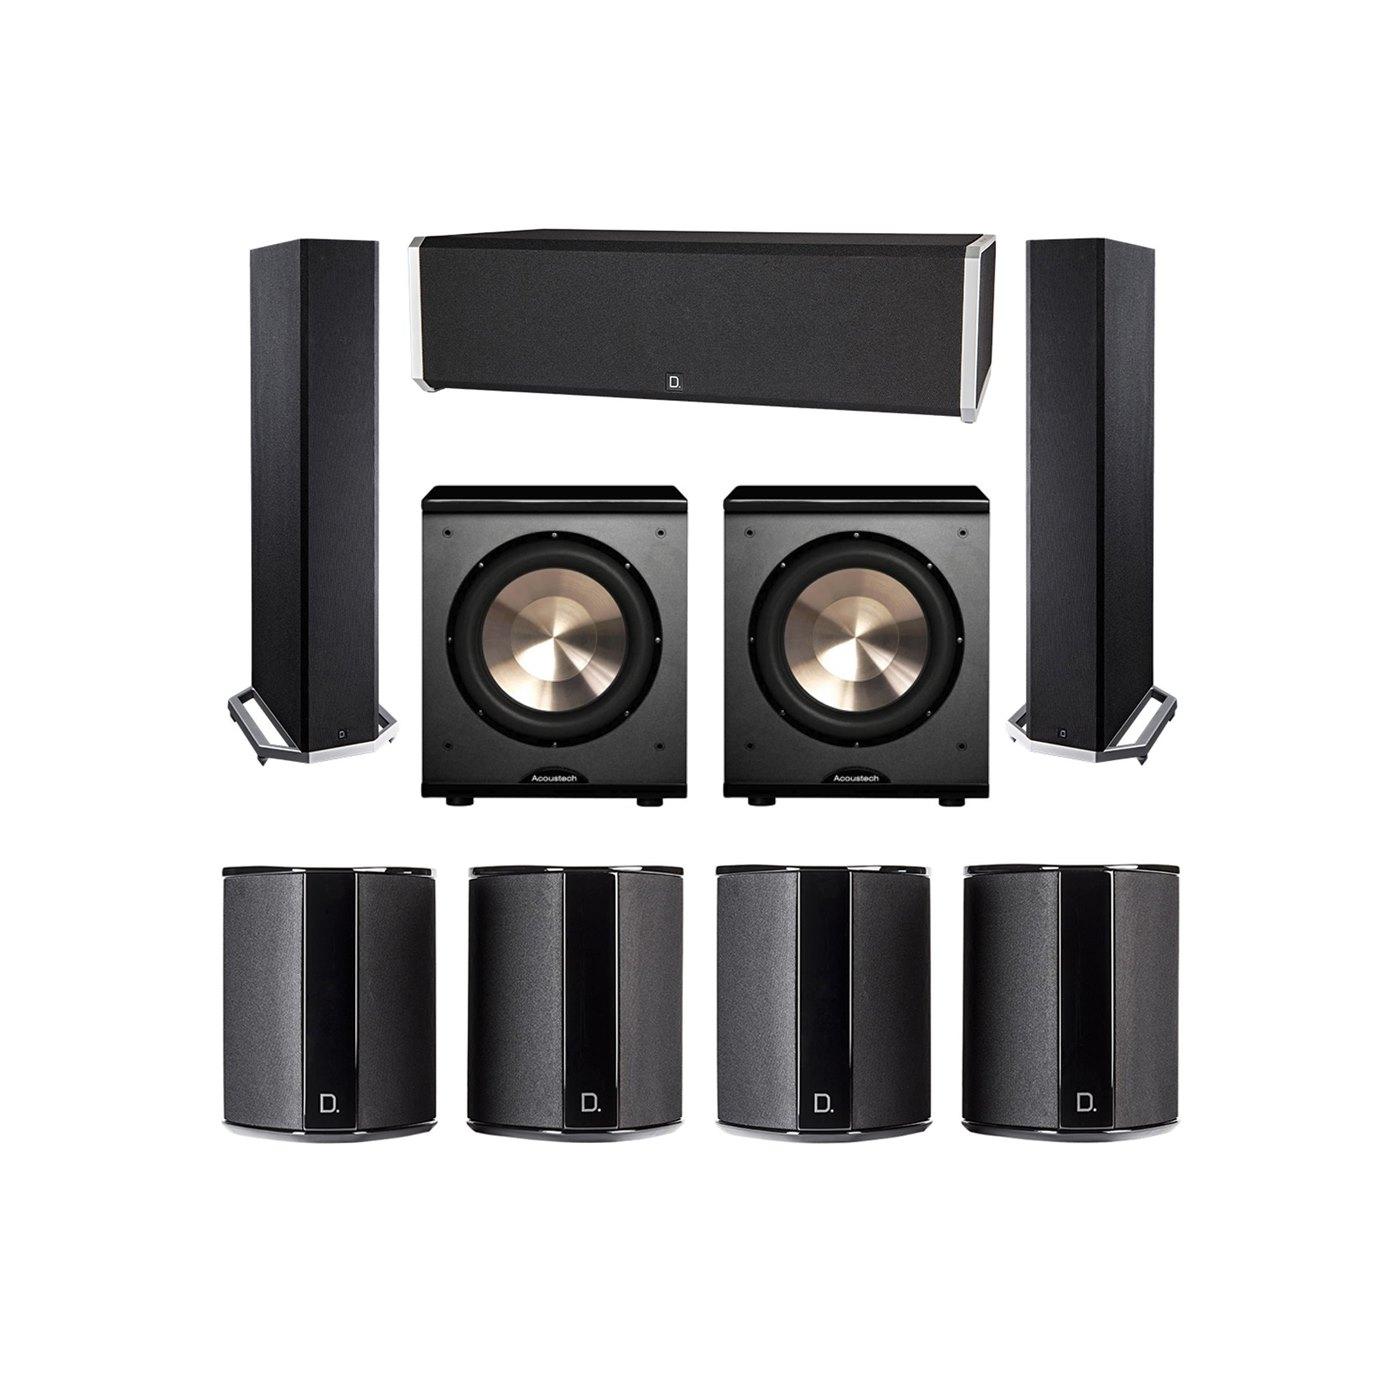 Definitive Technology 7.2 System with 2 BP9020 Tower Speakers, 1 CS9040 Center Channel Speaker, 4 SR9040 Surround Speaker, 2 BIC PL-200 Subwoofer